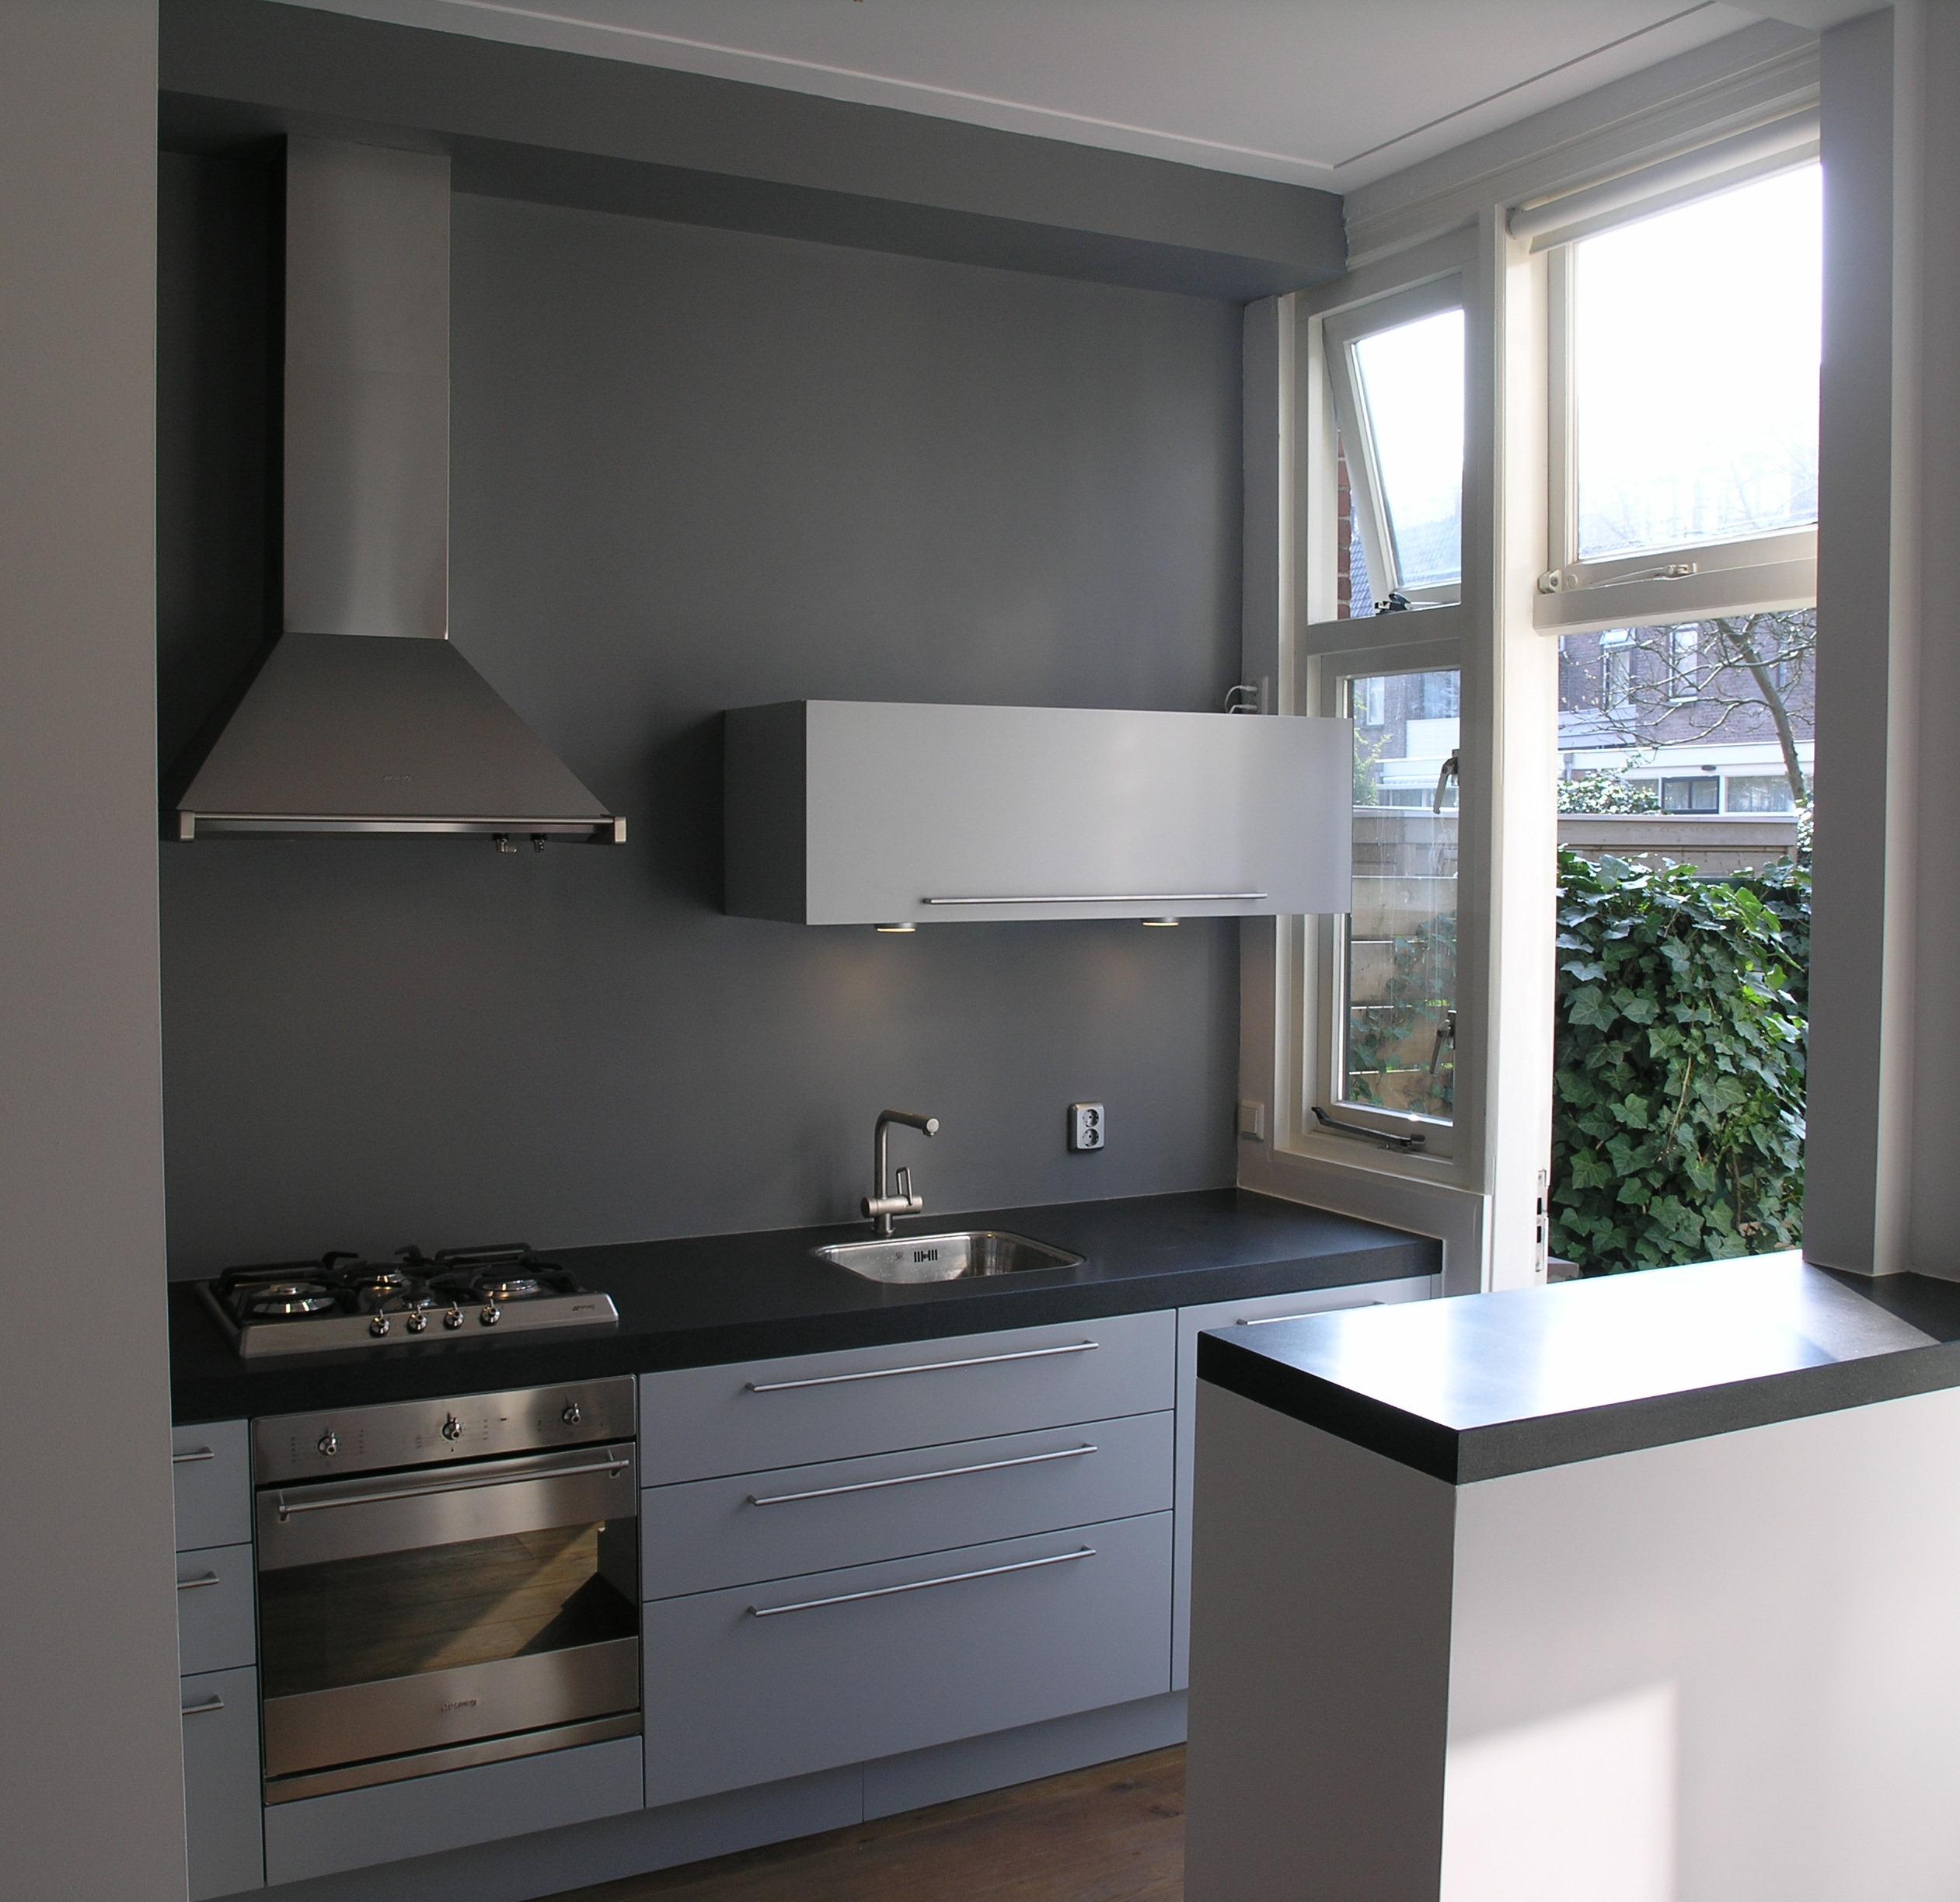 Design Keukens u00ab Thill Art